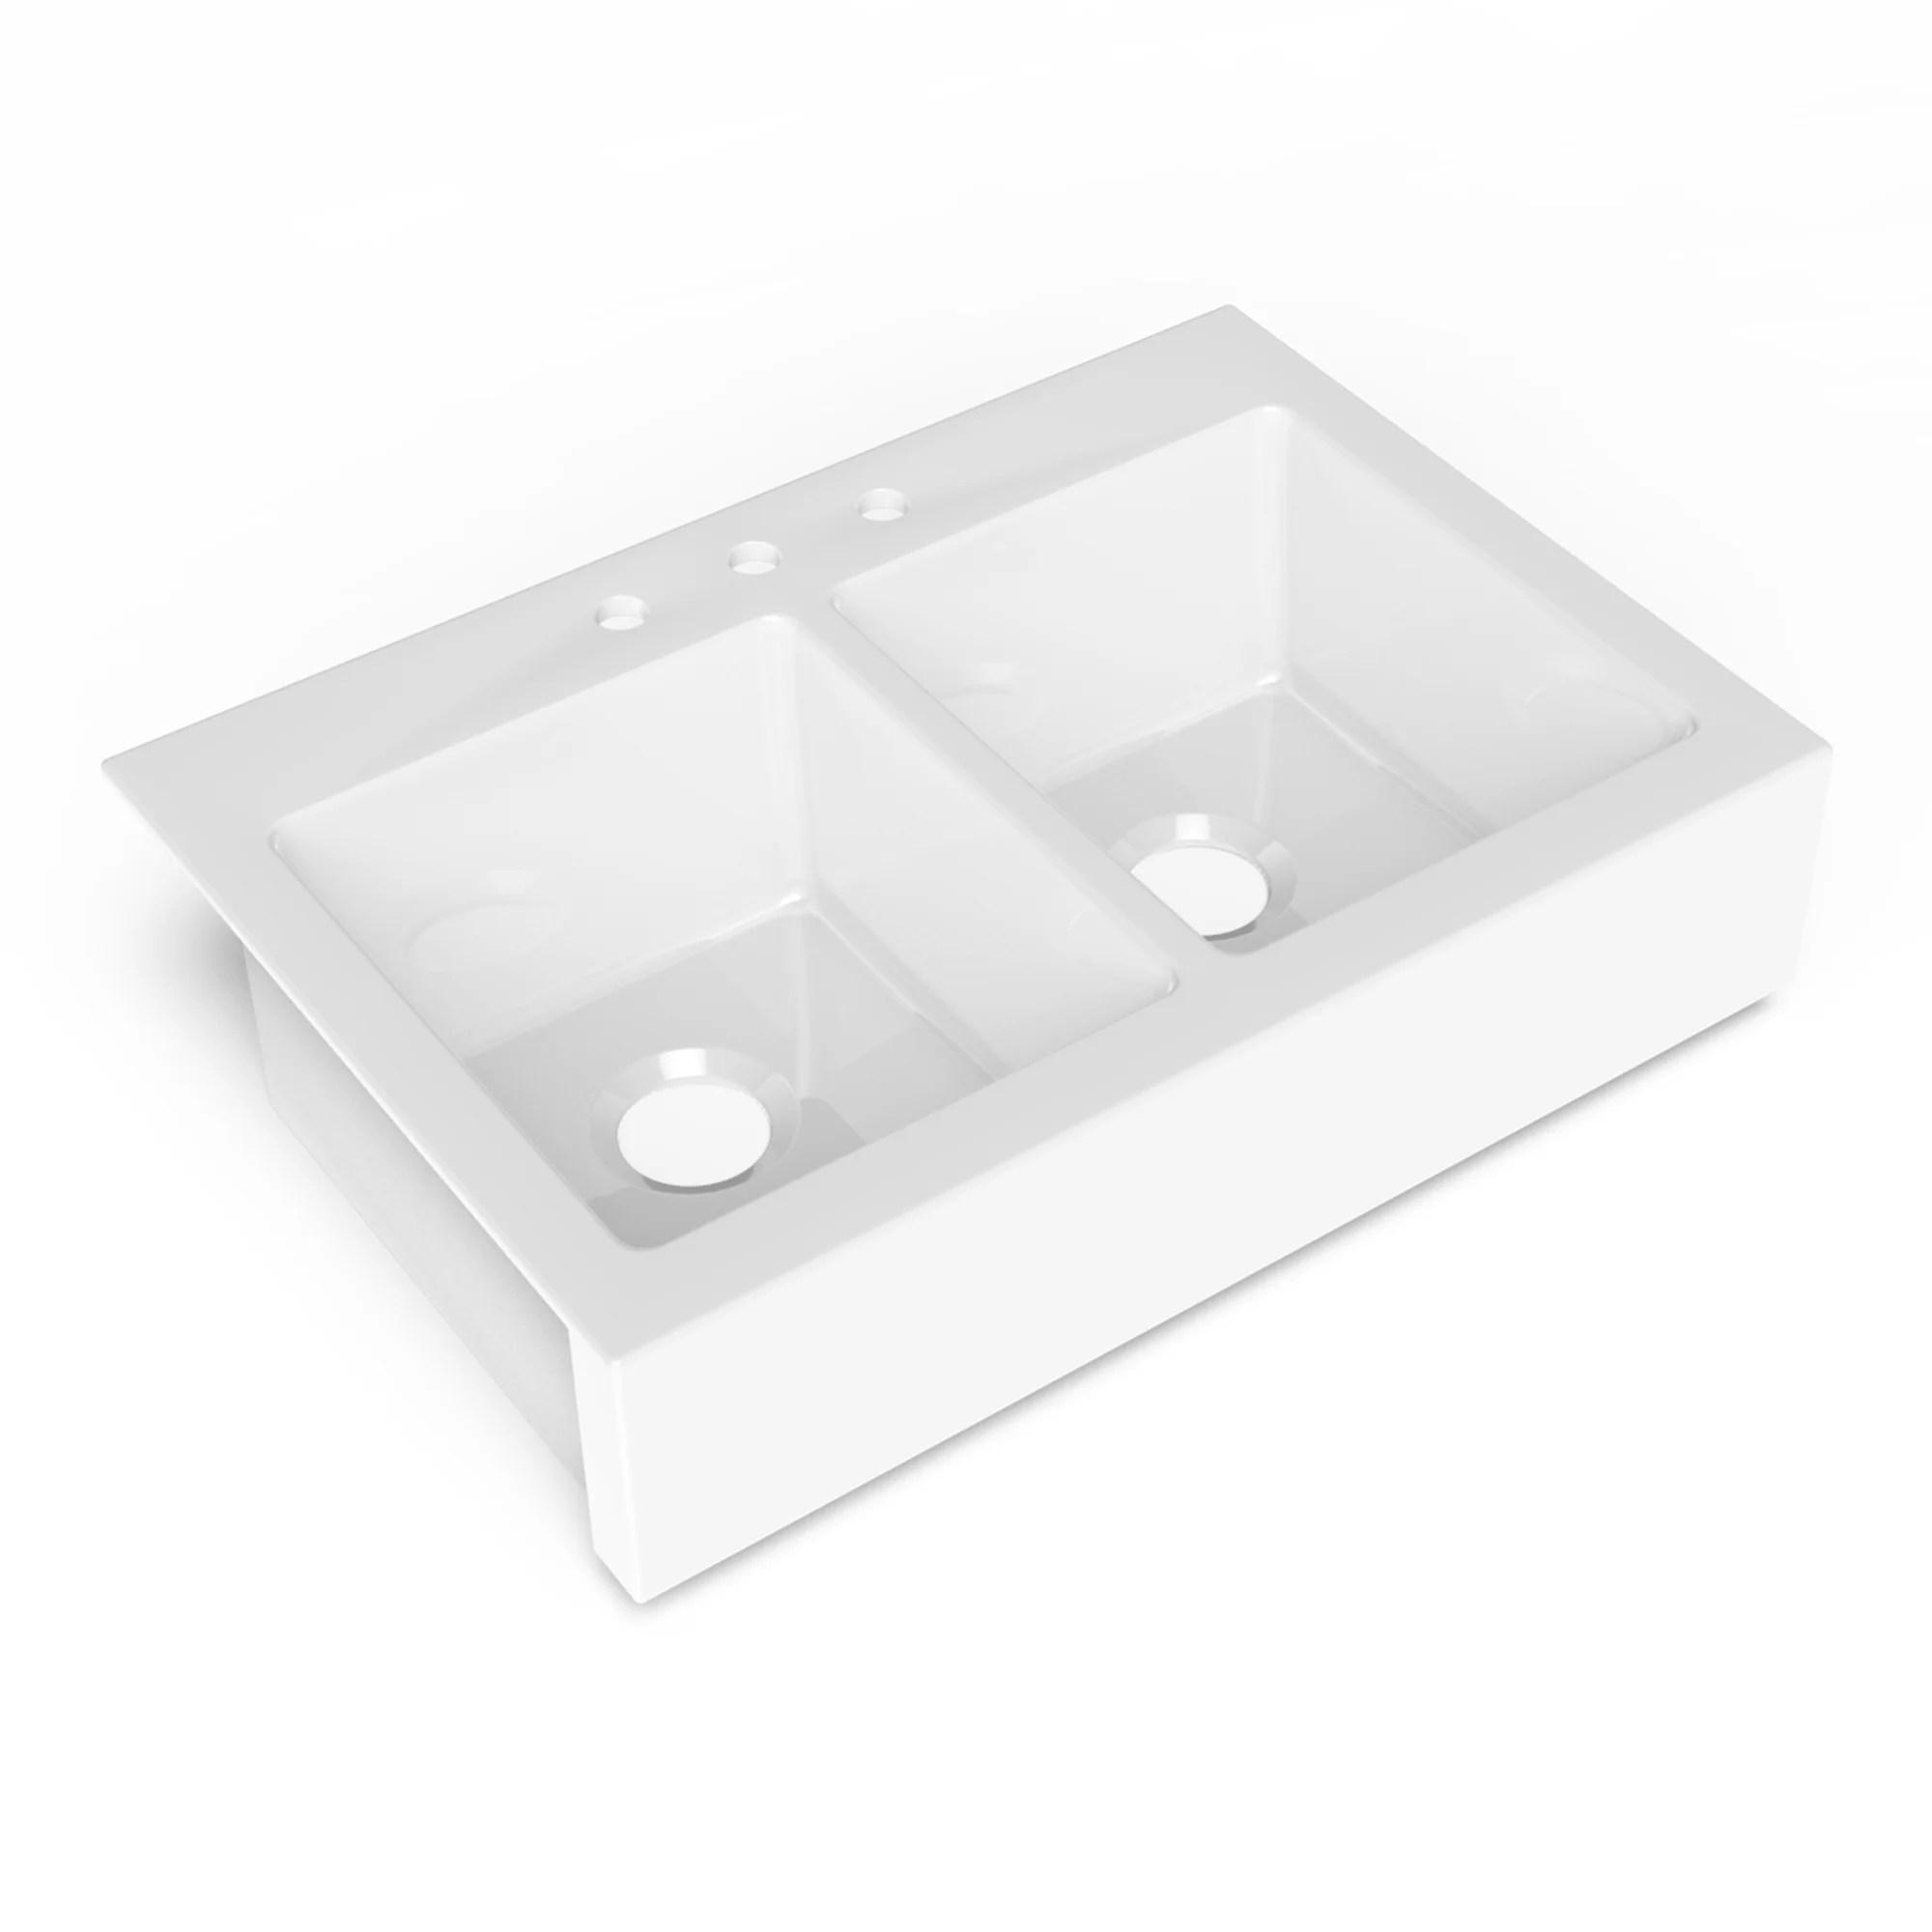 parker quickfit drop in farmhouse fireclay 33 85 in 3 hole double bowl kitchen sink in crisp white